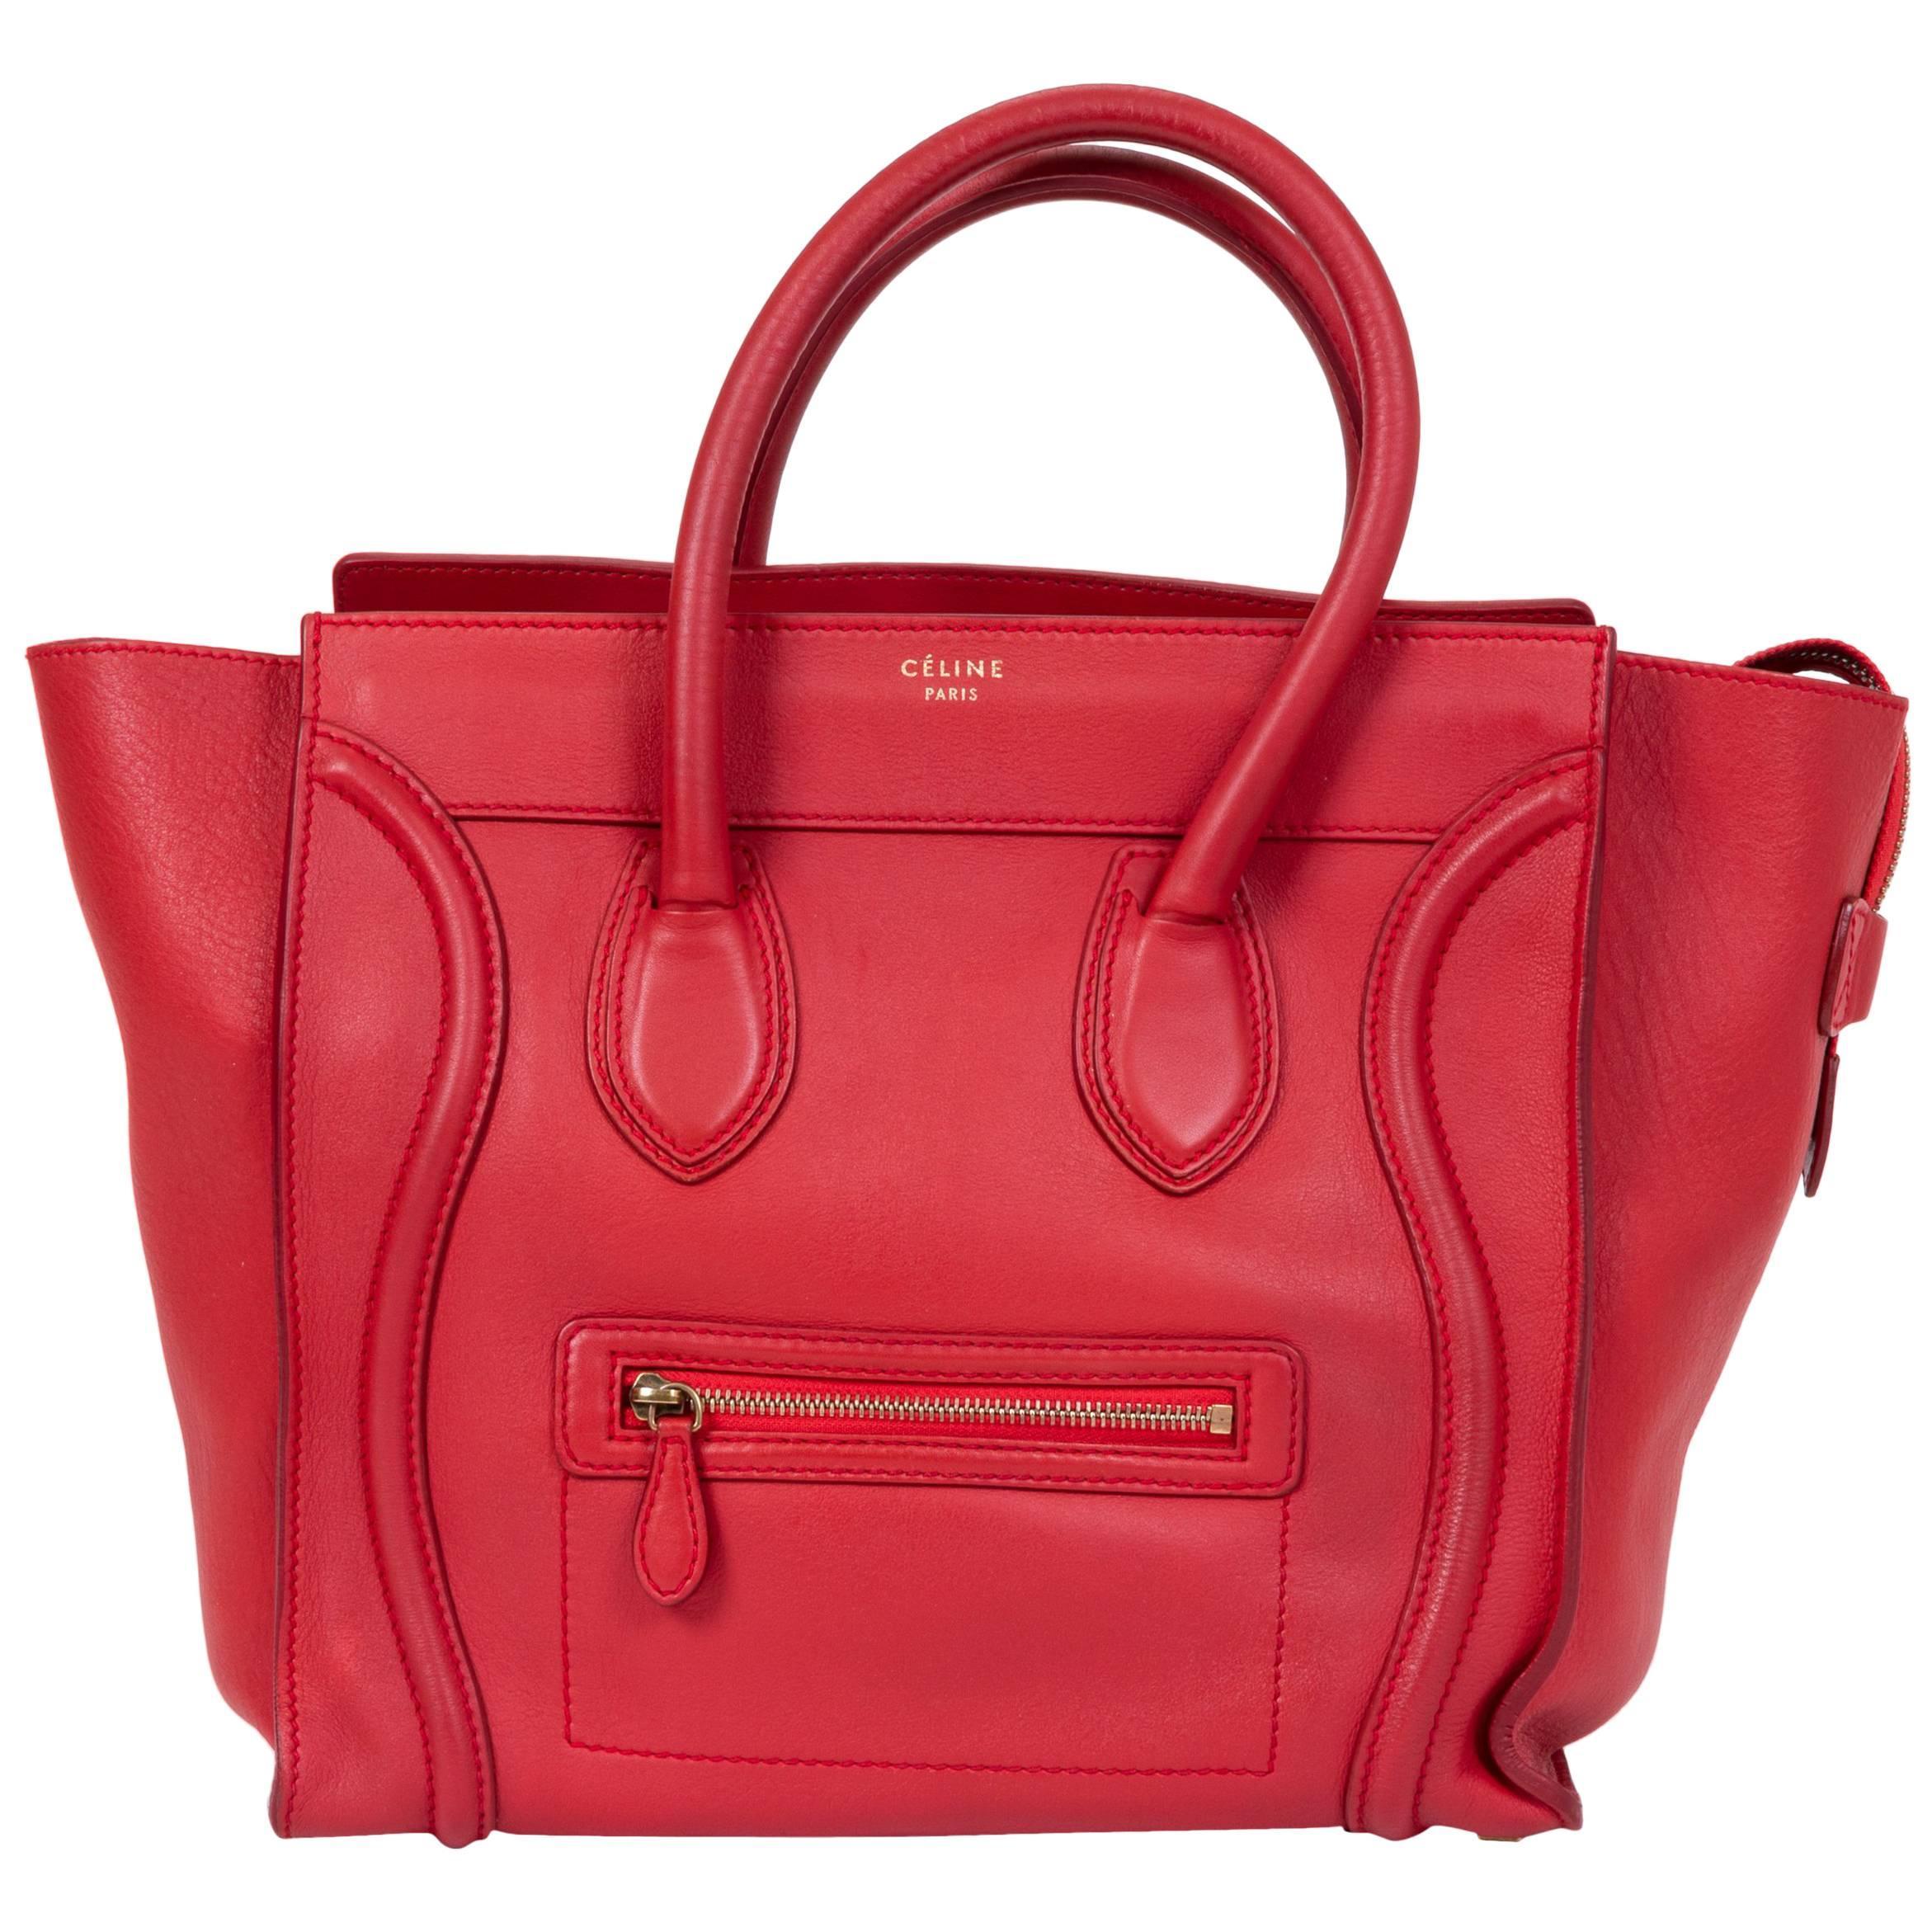 Celine Red Leather Mini Luggage Bag